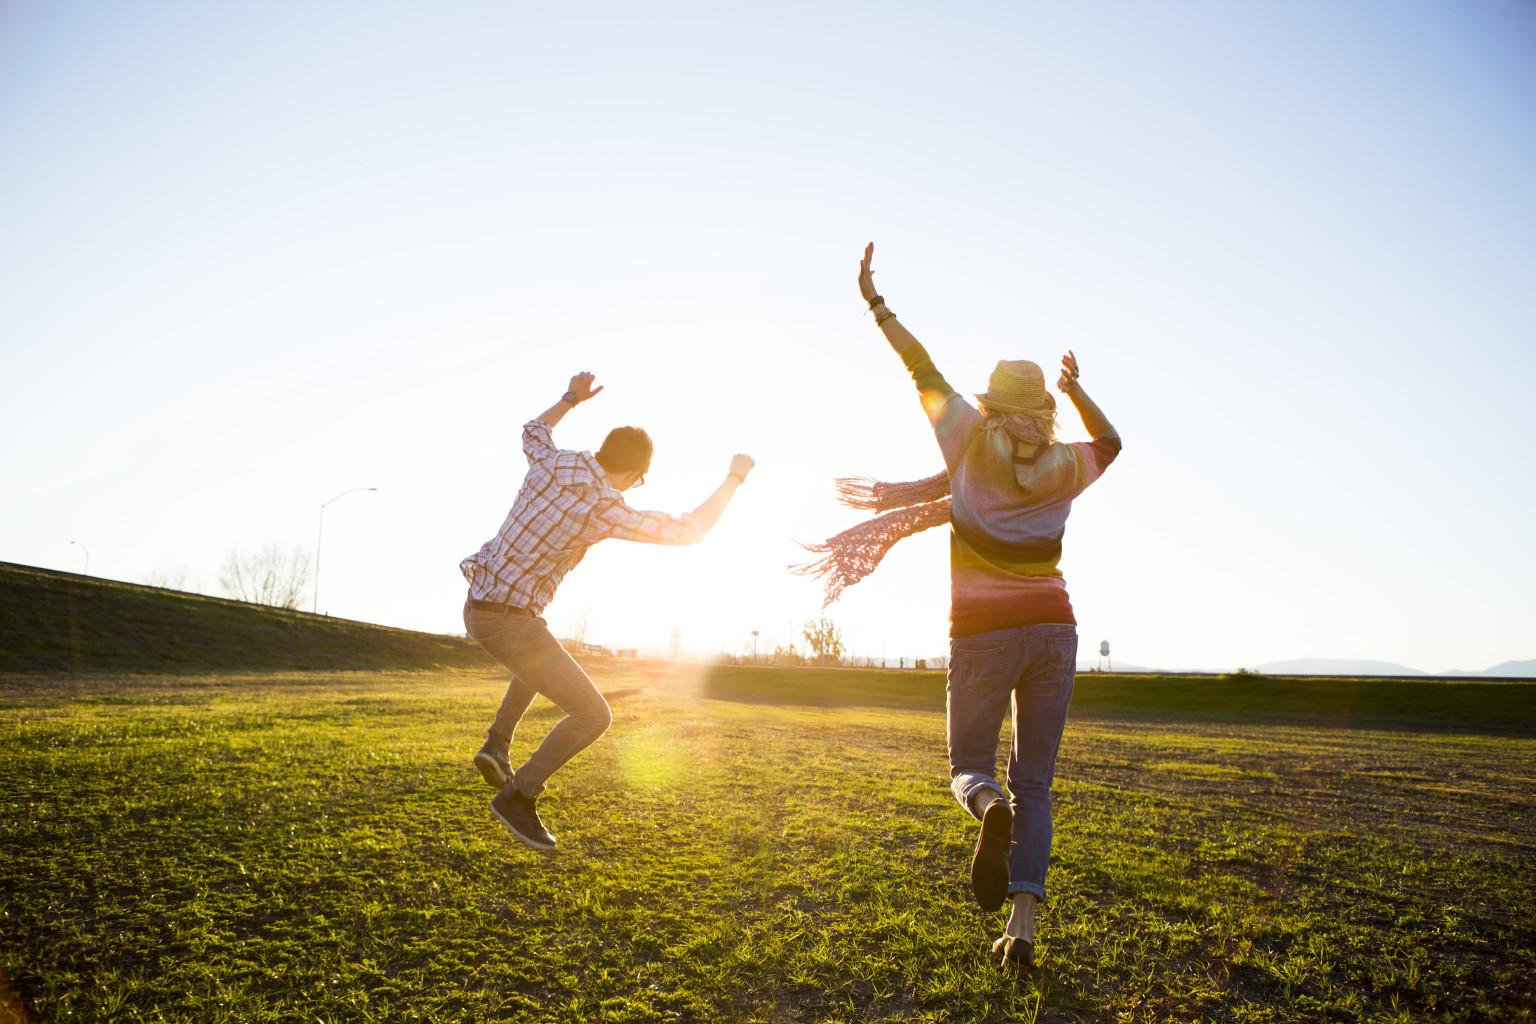 the-happy-habits-12-habits-for-happiness.jpg